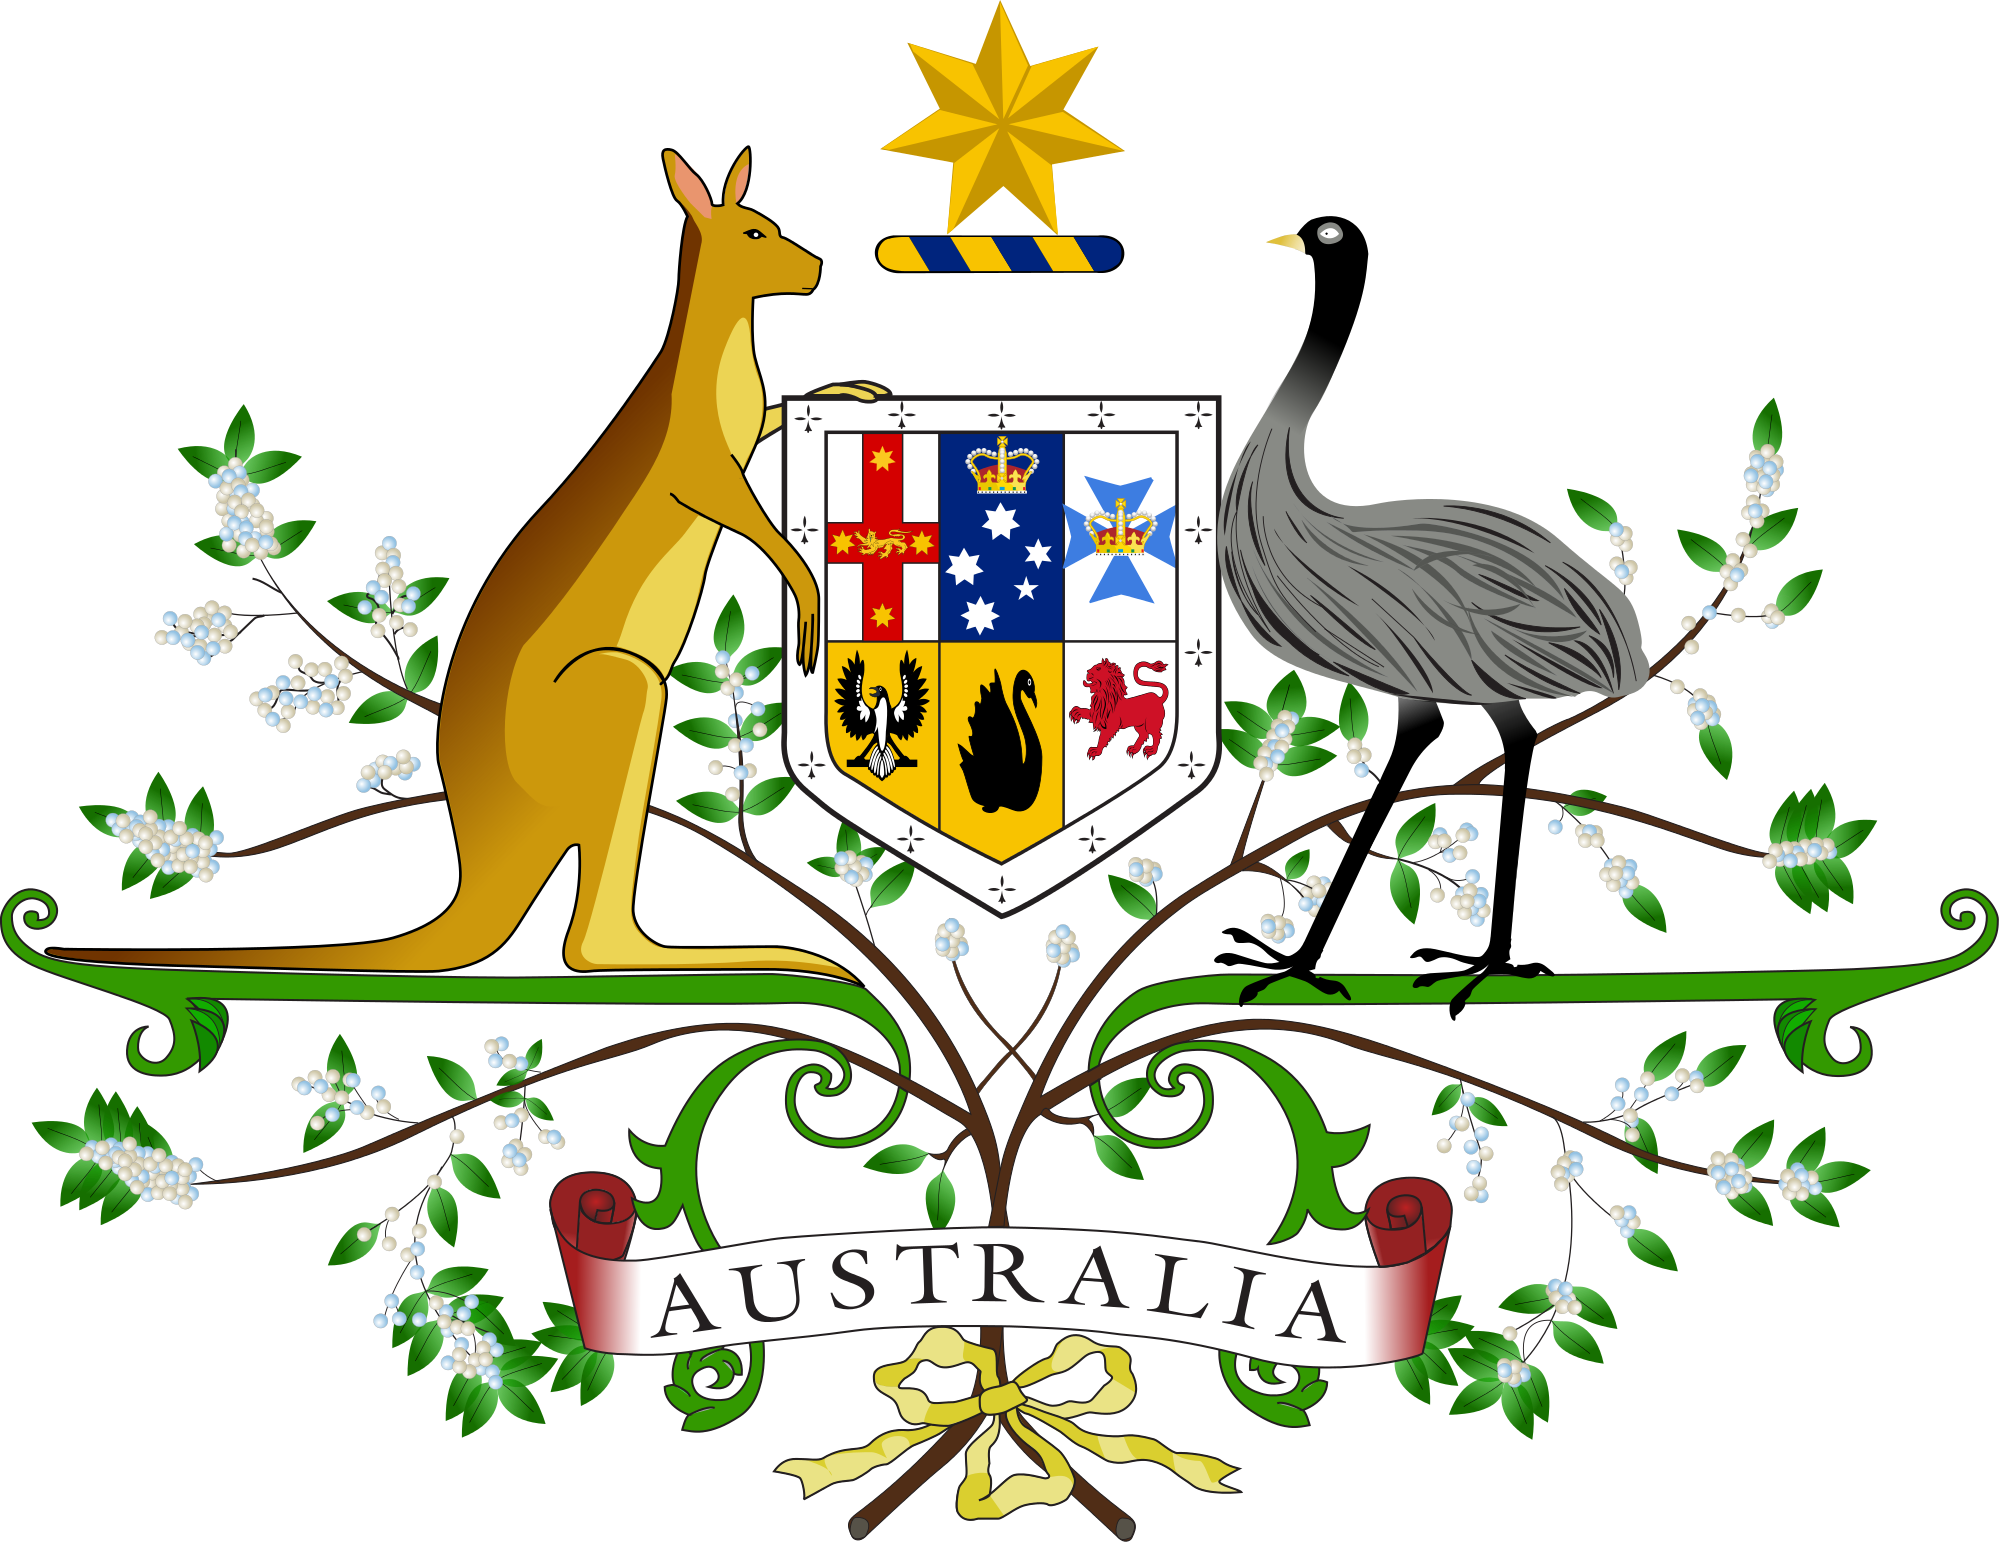 Clipart embassy australia vector transparent Download Gerb Australia Star Usa Coat National Arms Clipart PNG Free ... vector transparent